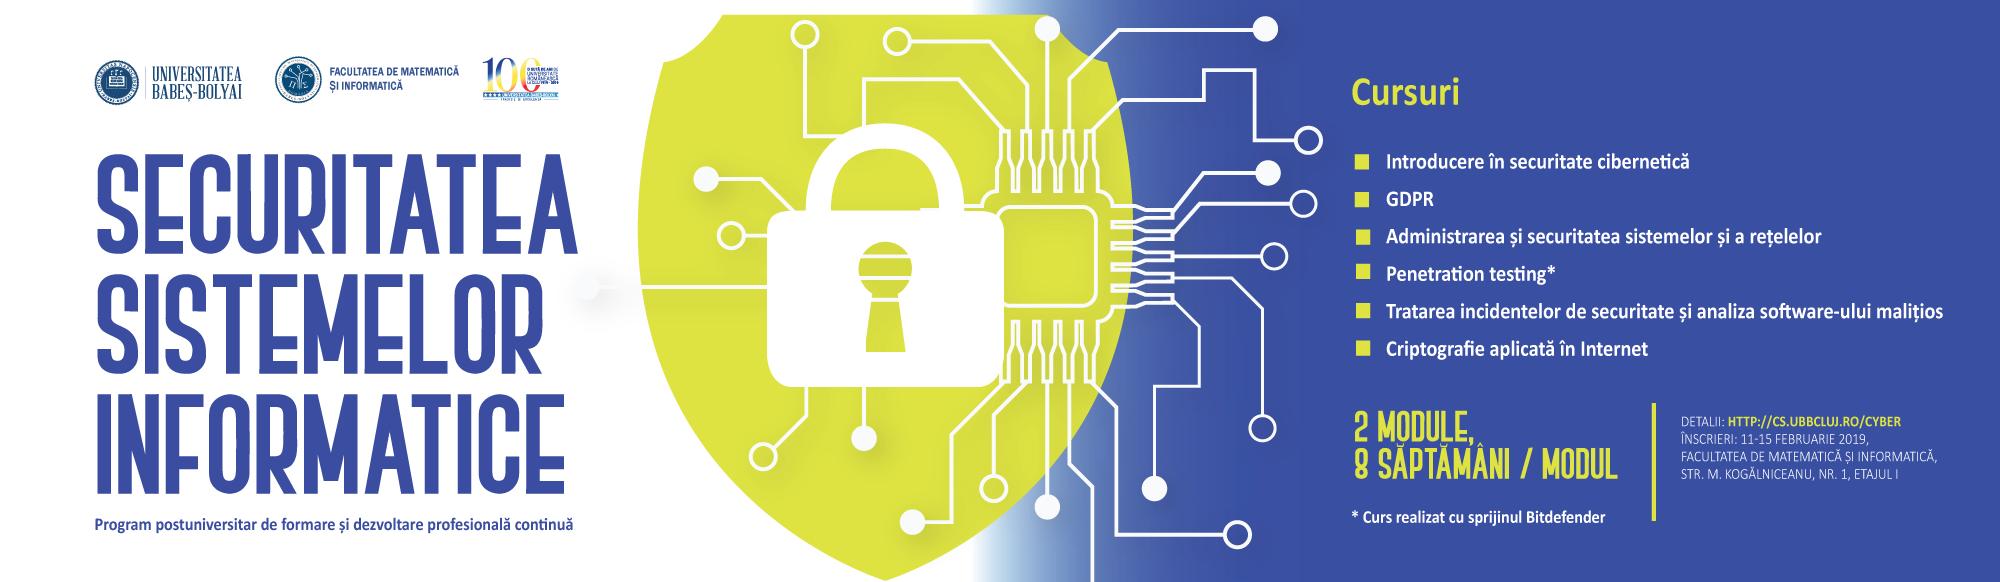 Banner securitatea sistemelor informatice - NEWSUBB